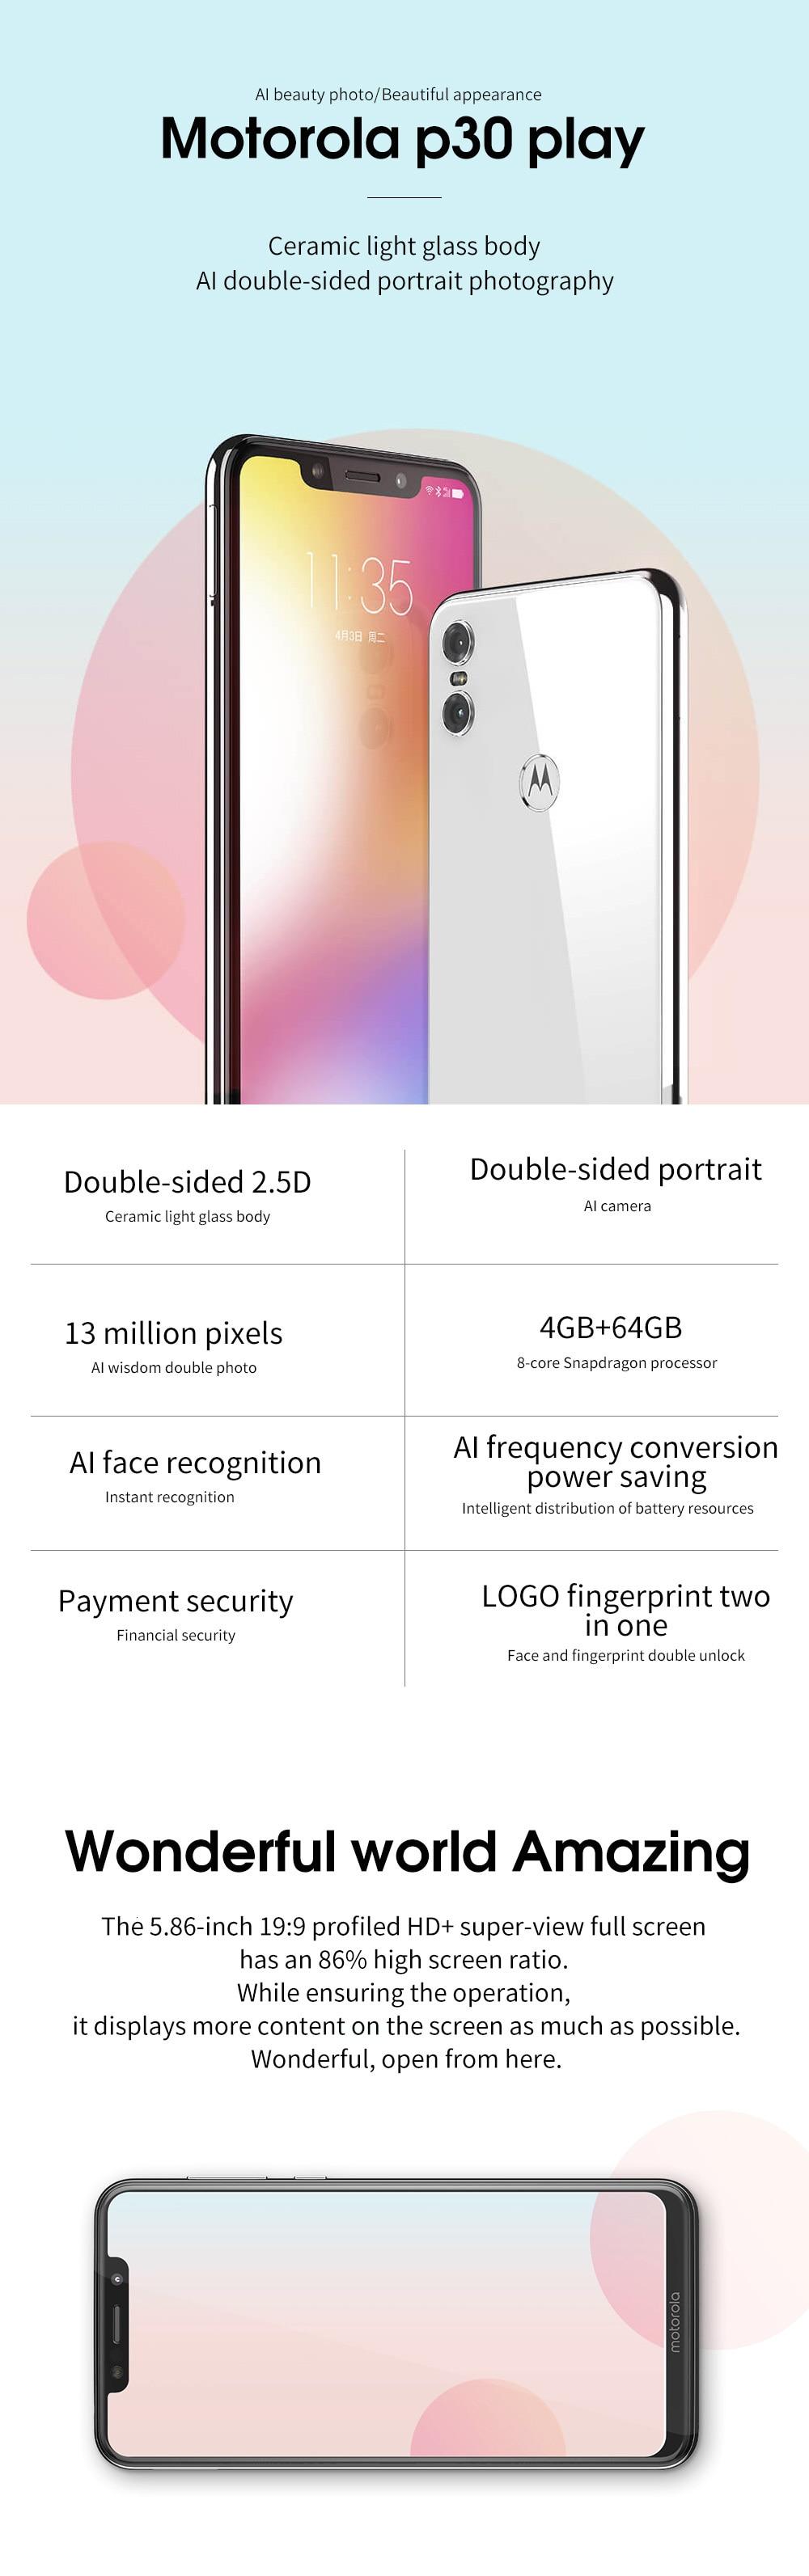 H240847a6497c409ba282318d6d8ef349c Moto One Mobile Phone 4GB 64GB AI Camera Smartphone 2.5D Double-sided Glass Body Octa Core Phone Support Face Fingerprint Unlock